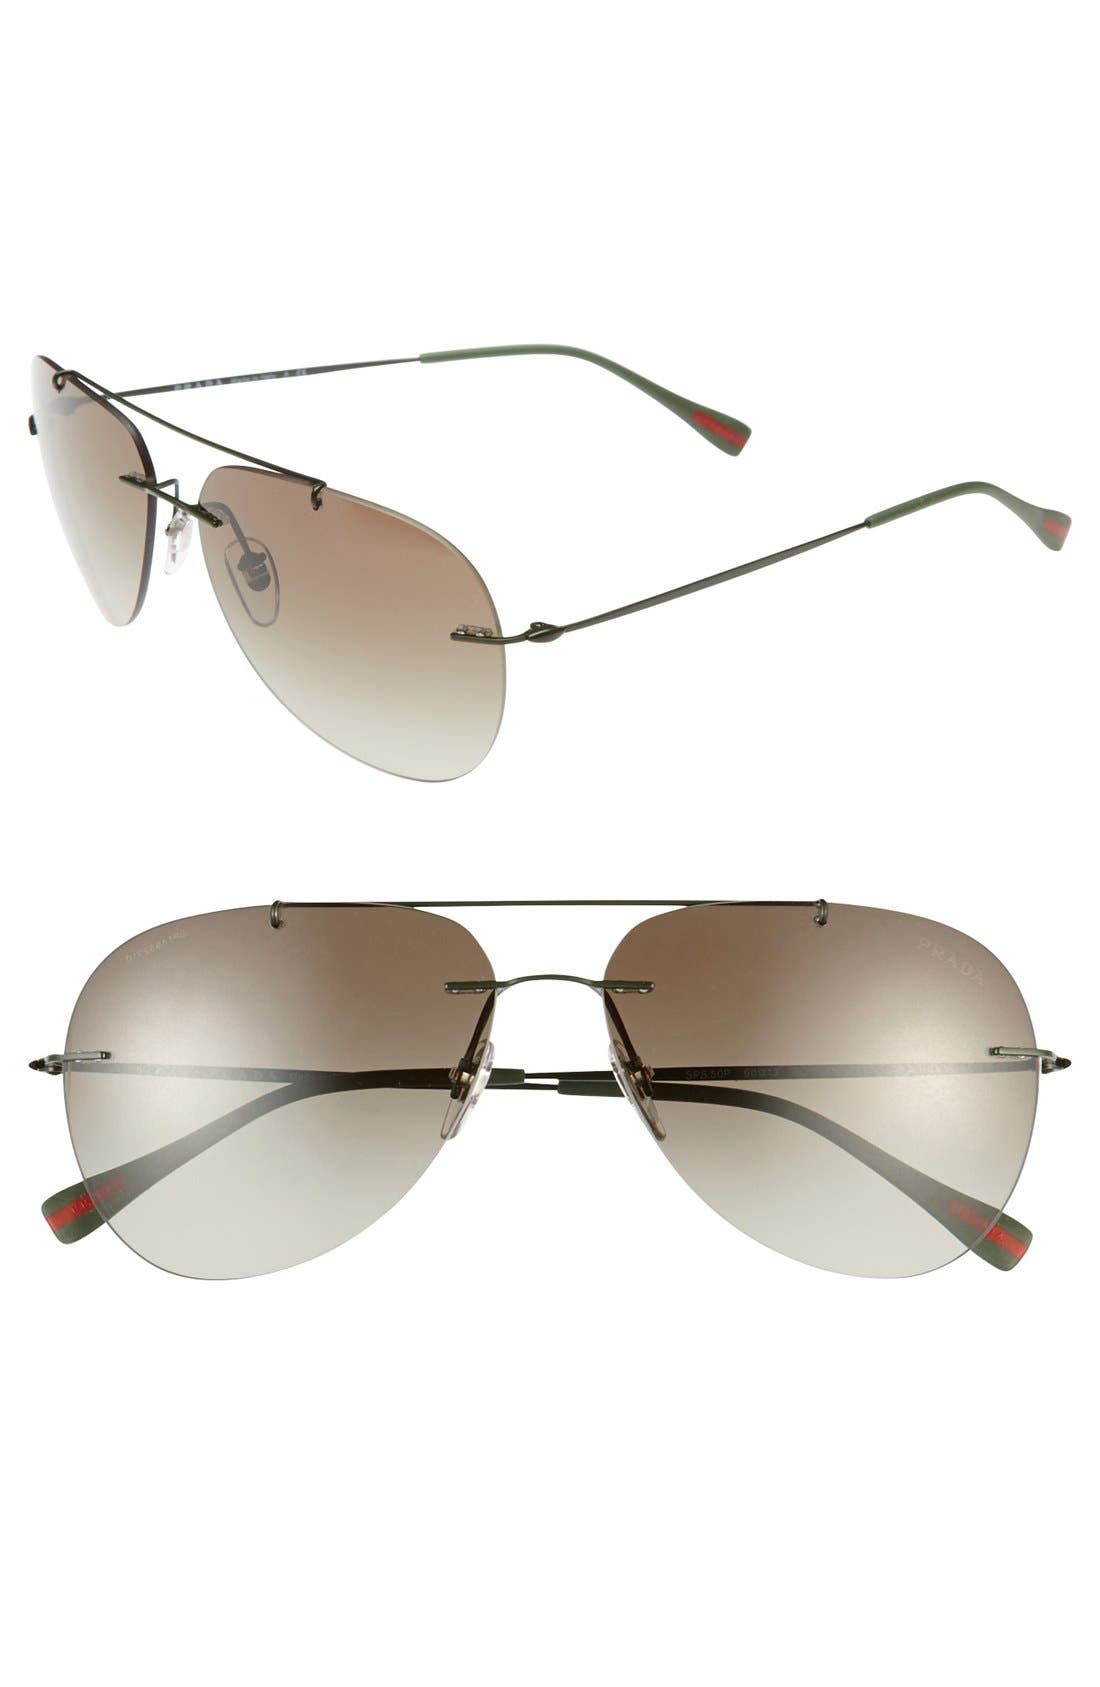 'Pilot' 60mm Rimless Sunglasses,                             Main thumbnail 1, color,                             Military Green